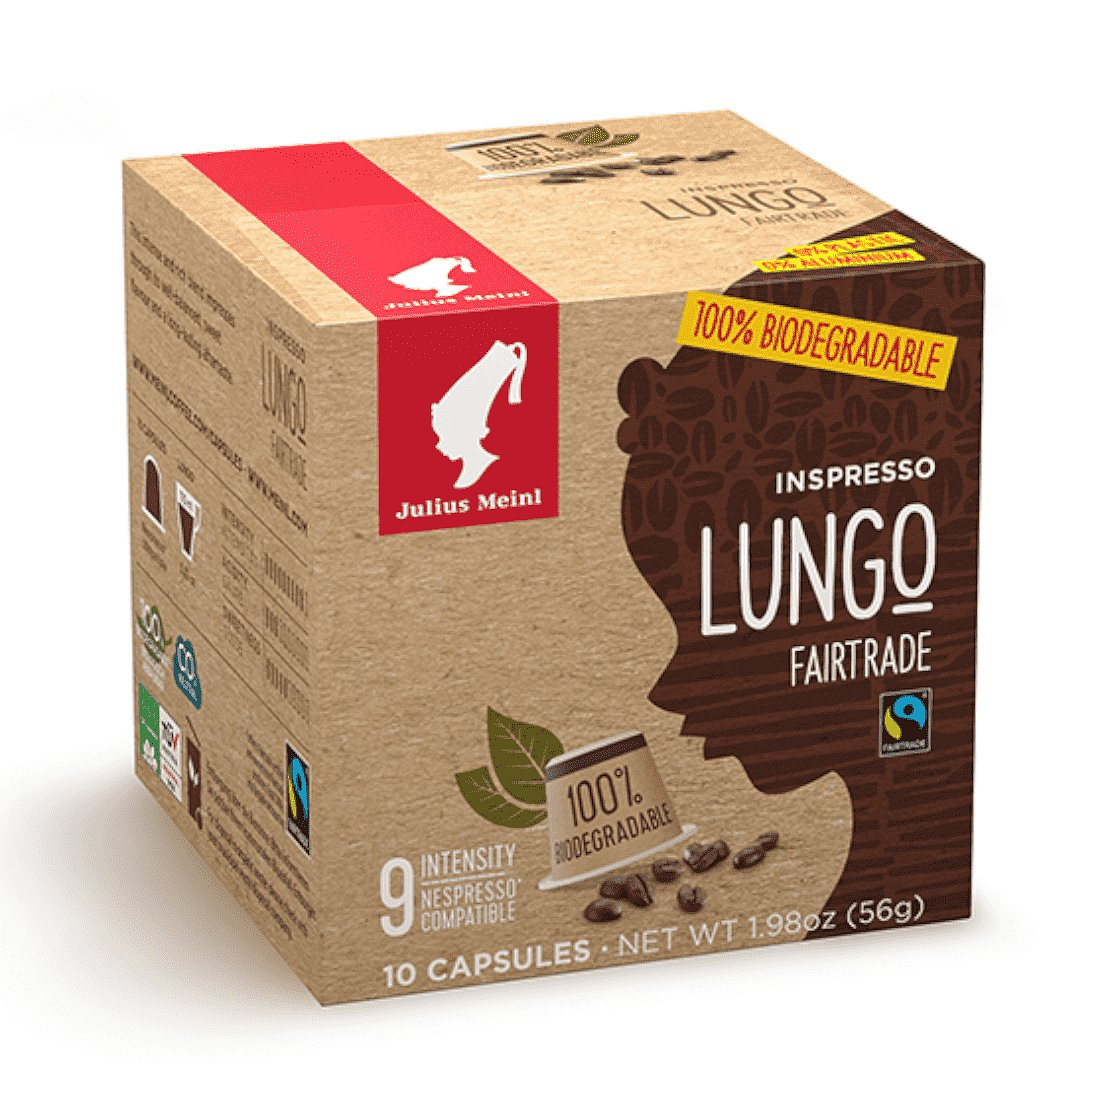 Kompostovatelné kapsle Inspresso Lungo Fairtrade